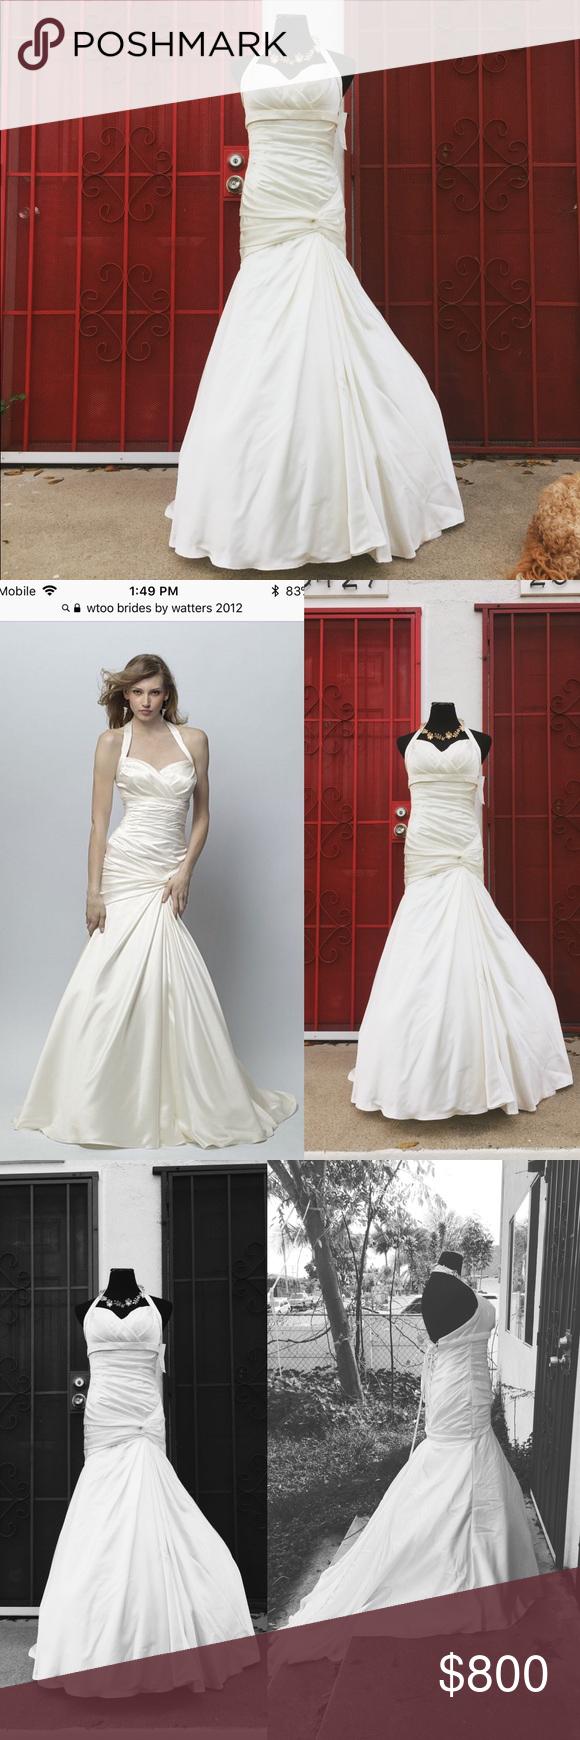 Wedding dress dry cleaning near me  Ivory Wedding Dress by Watters NWT  My Posh Picks  Pinterest